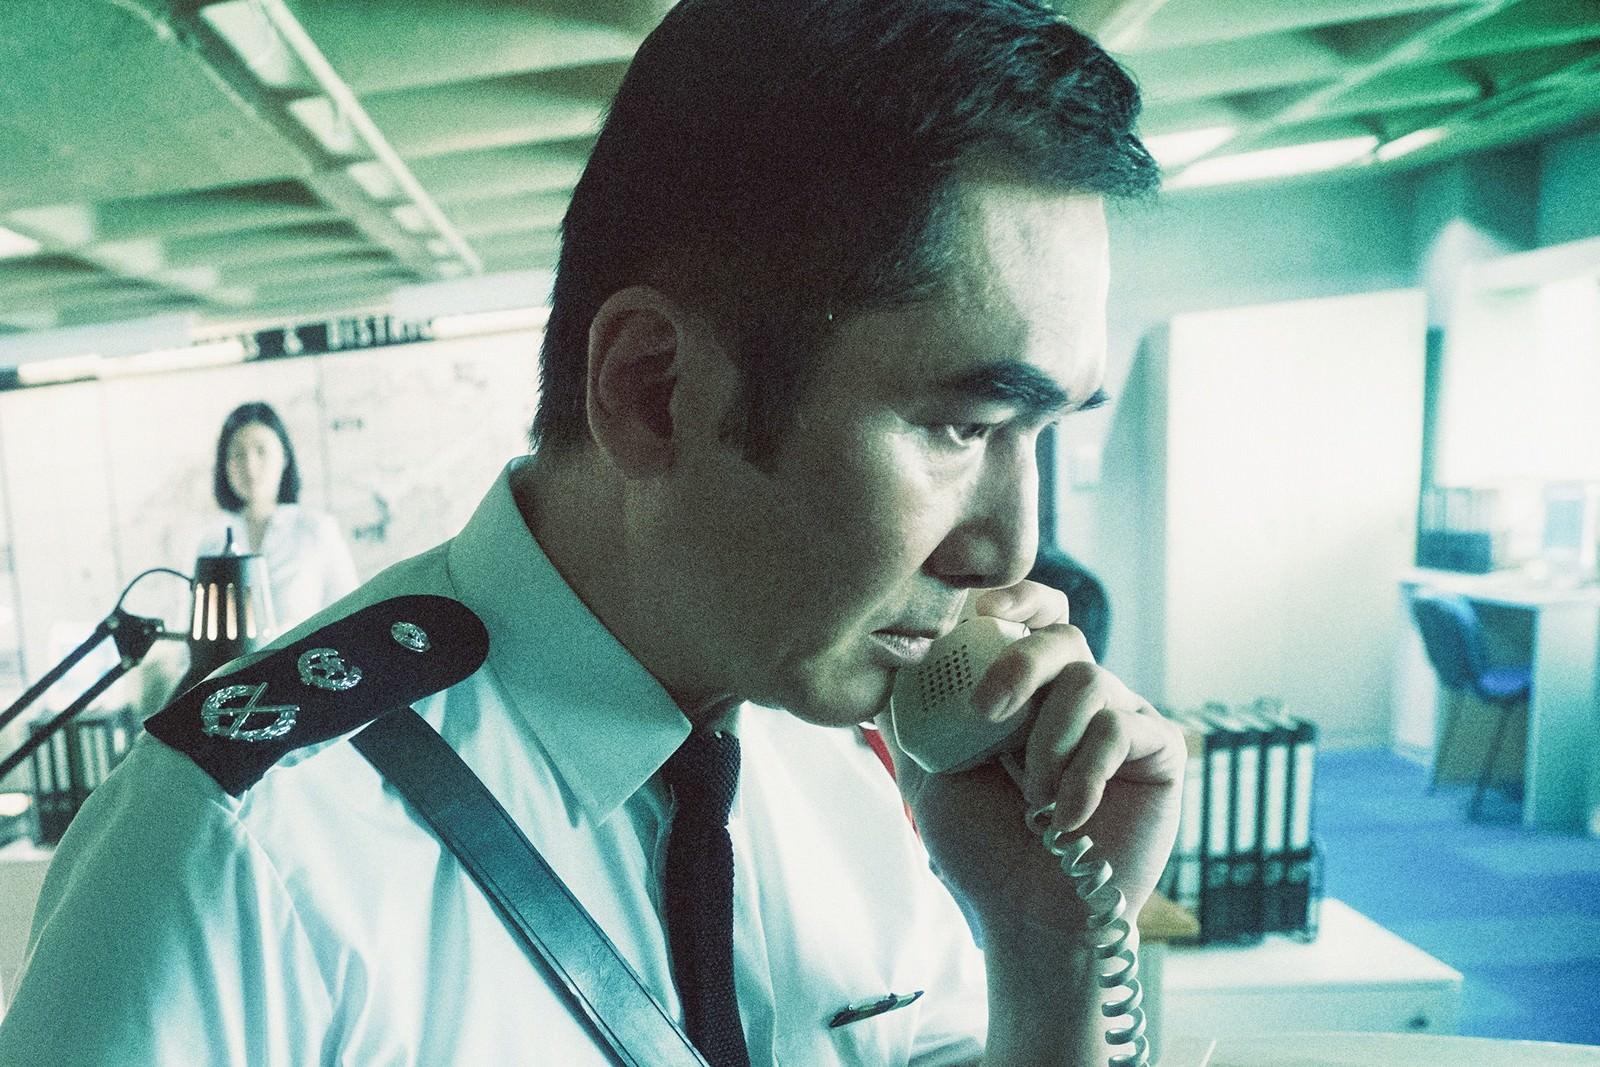 Movie, 無雙(中國.香港, 2018) / 無雙(台灣) / 无双(中國) / Project Gutenberg(英文), 電影劇照, 角色與演員介紹